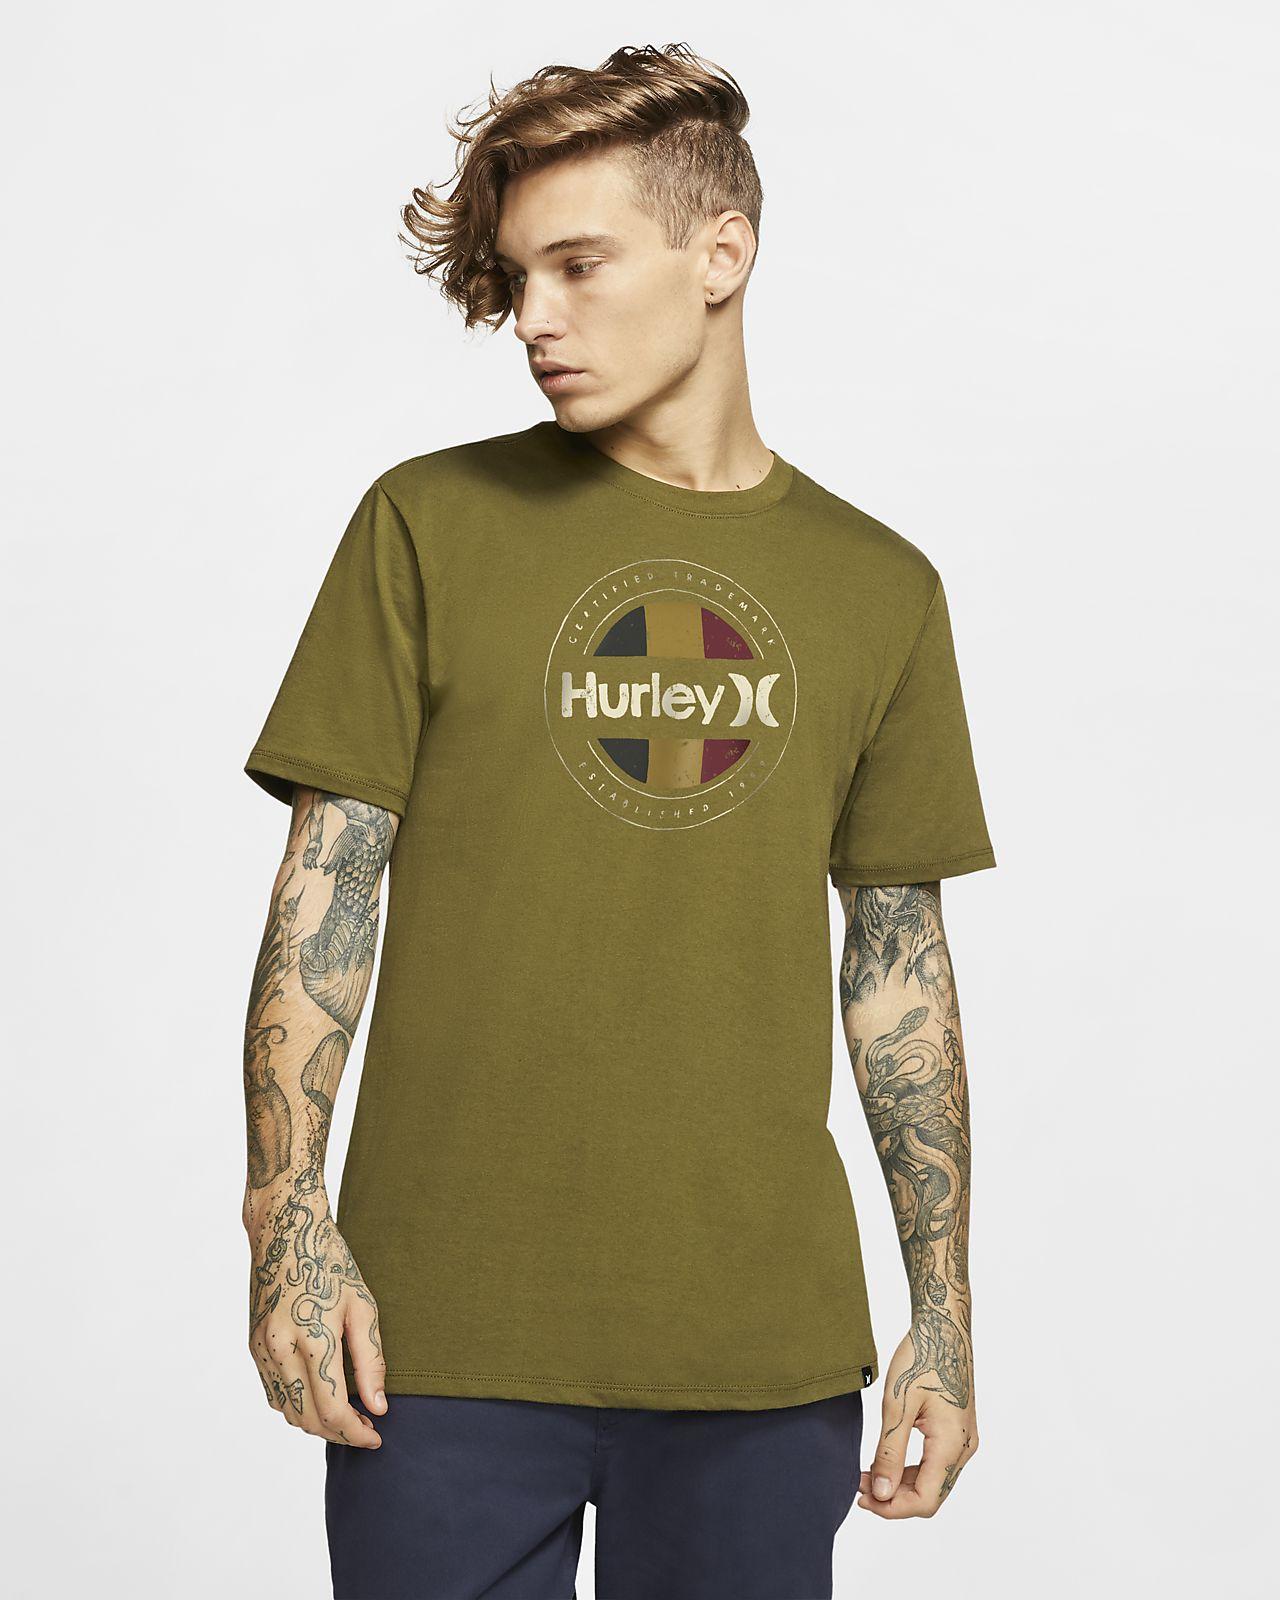 Hurley Premium Resistance Men's Premium Fit T-Shirt